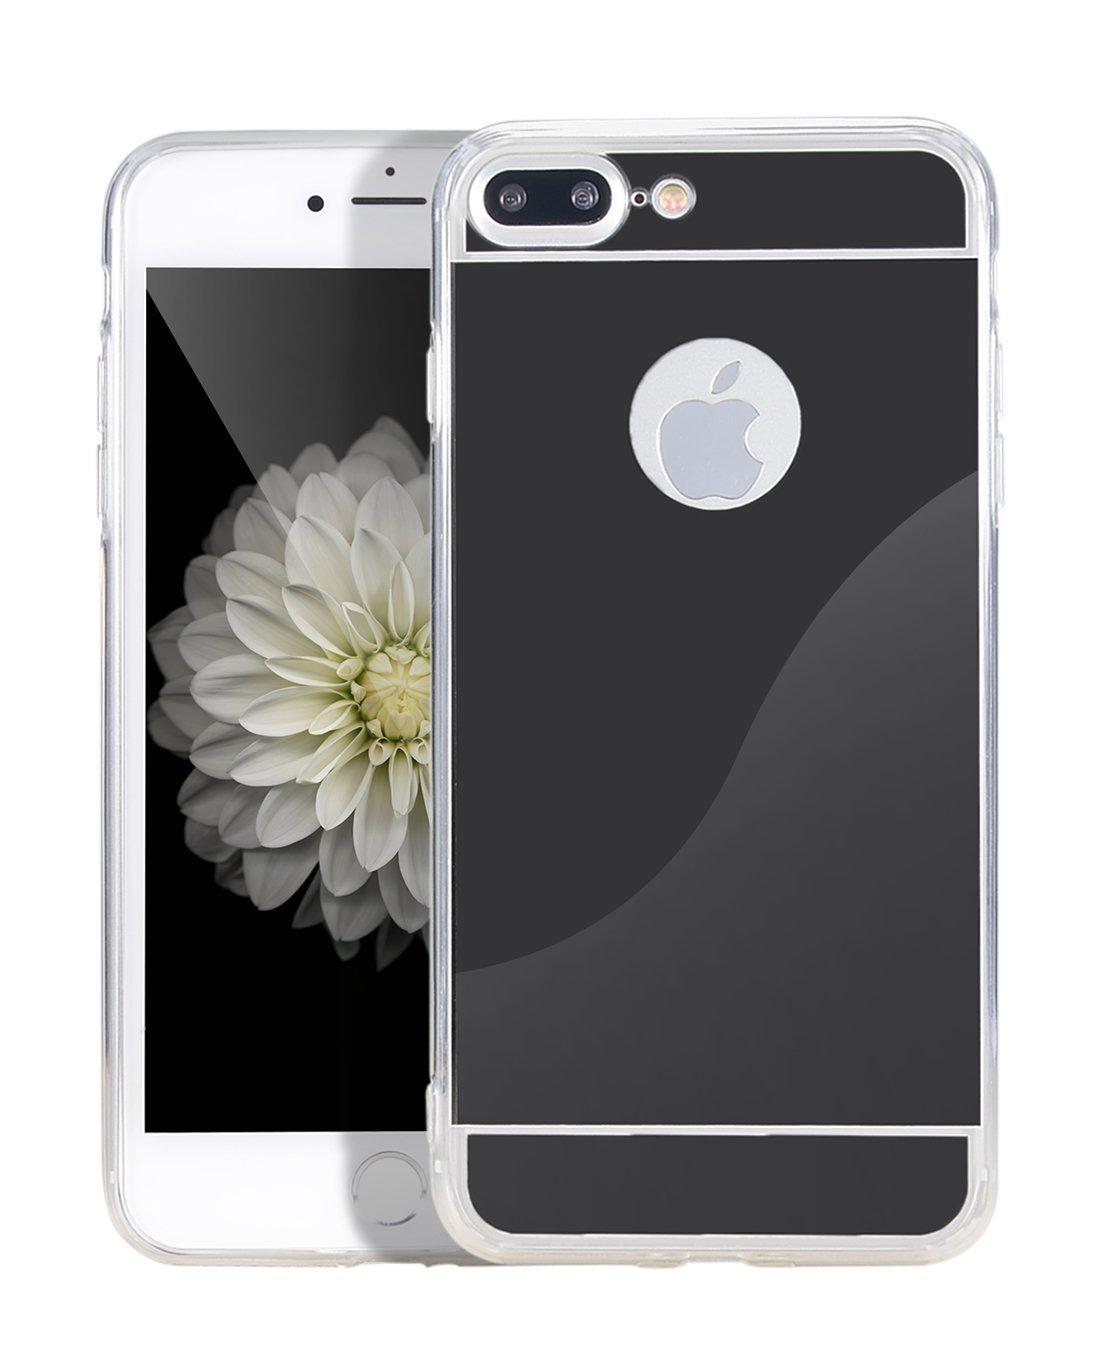 Zrcadlový kryt My Mirror pro iPhone 7 Plus - Černý (black)